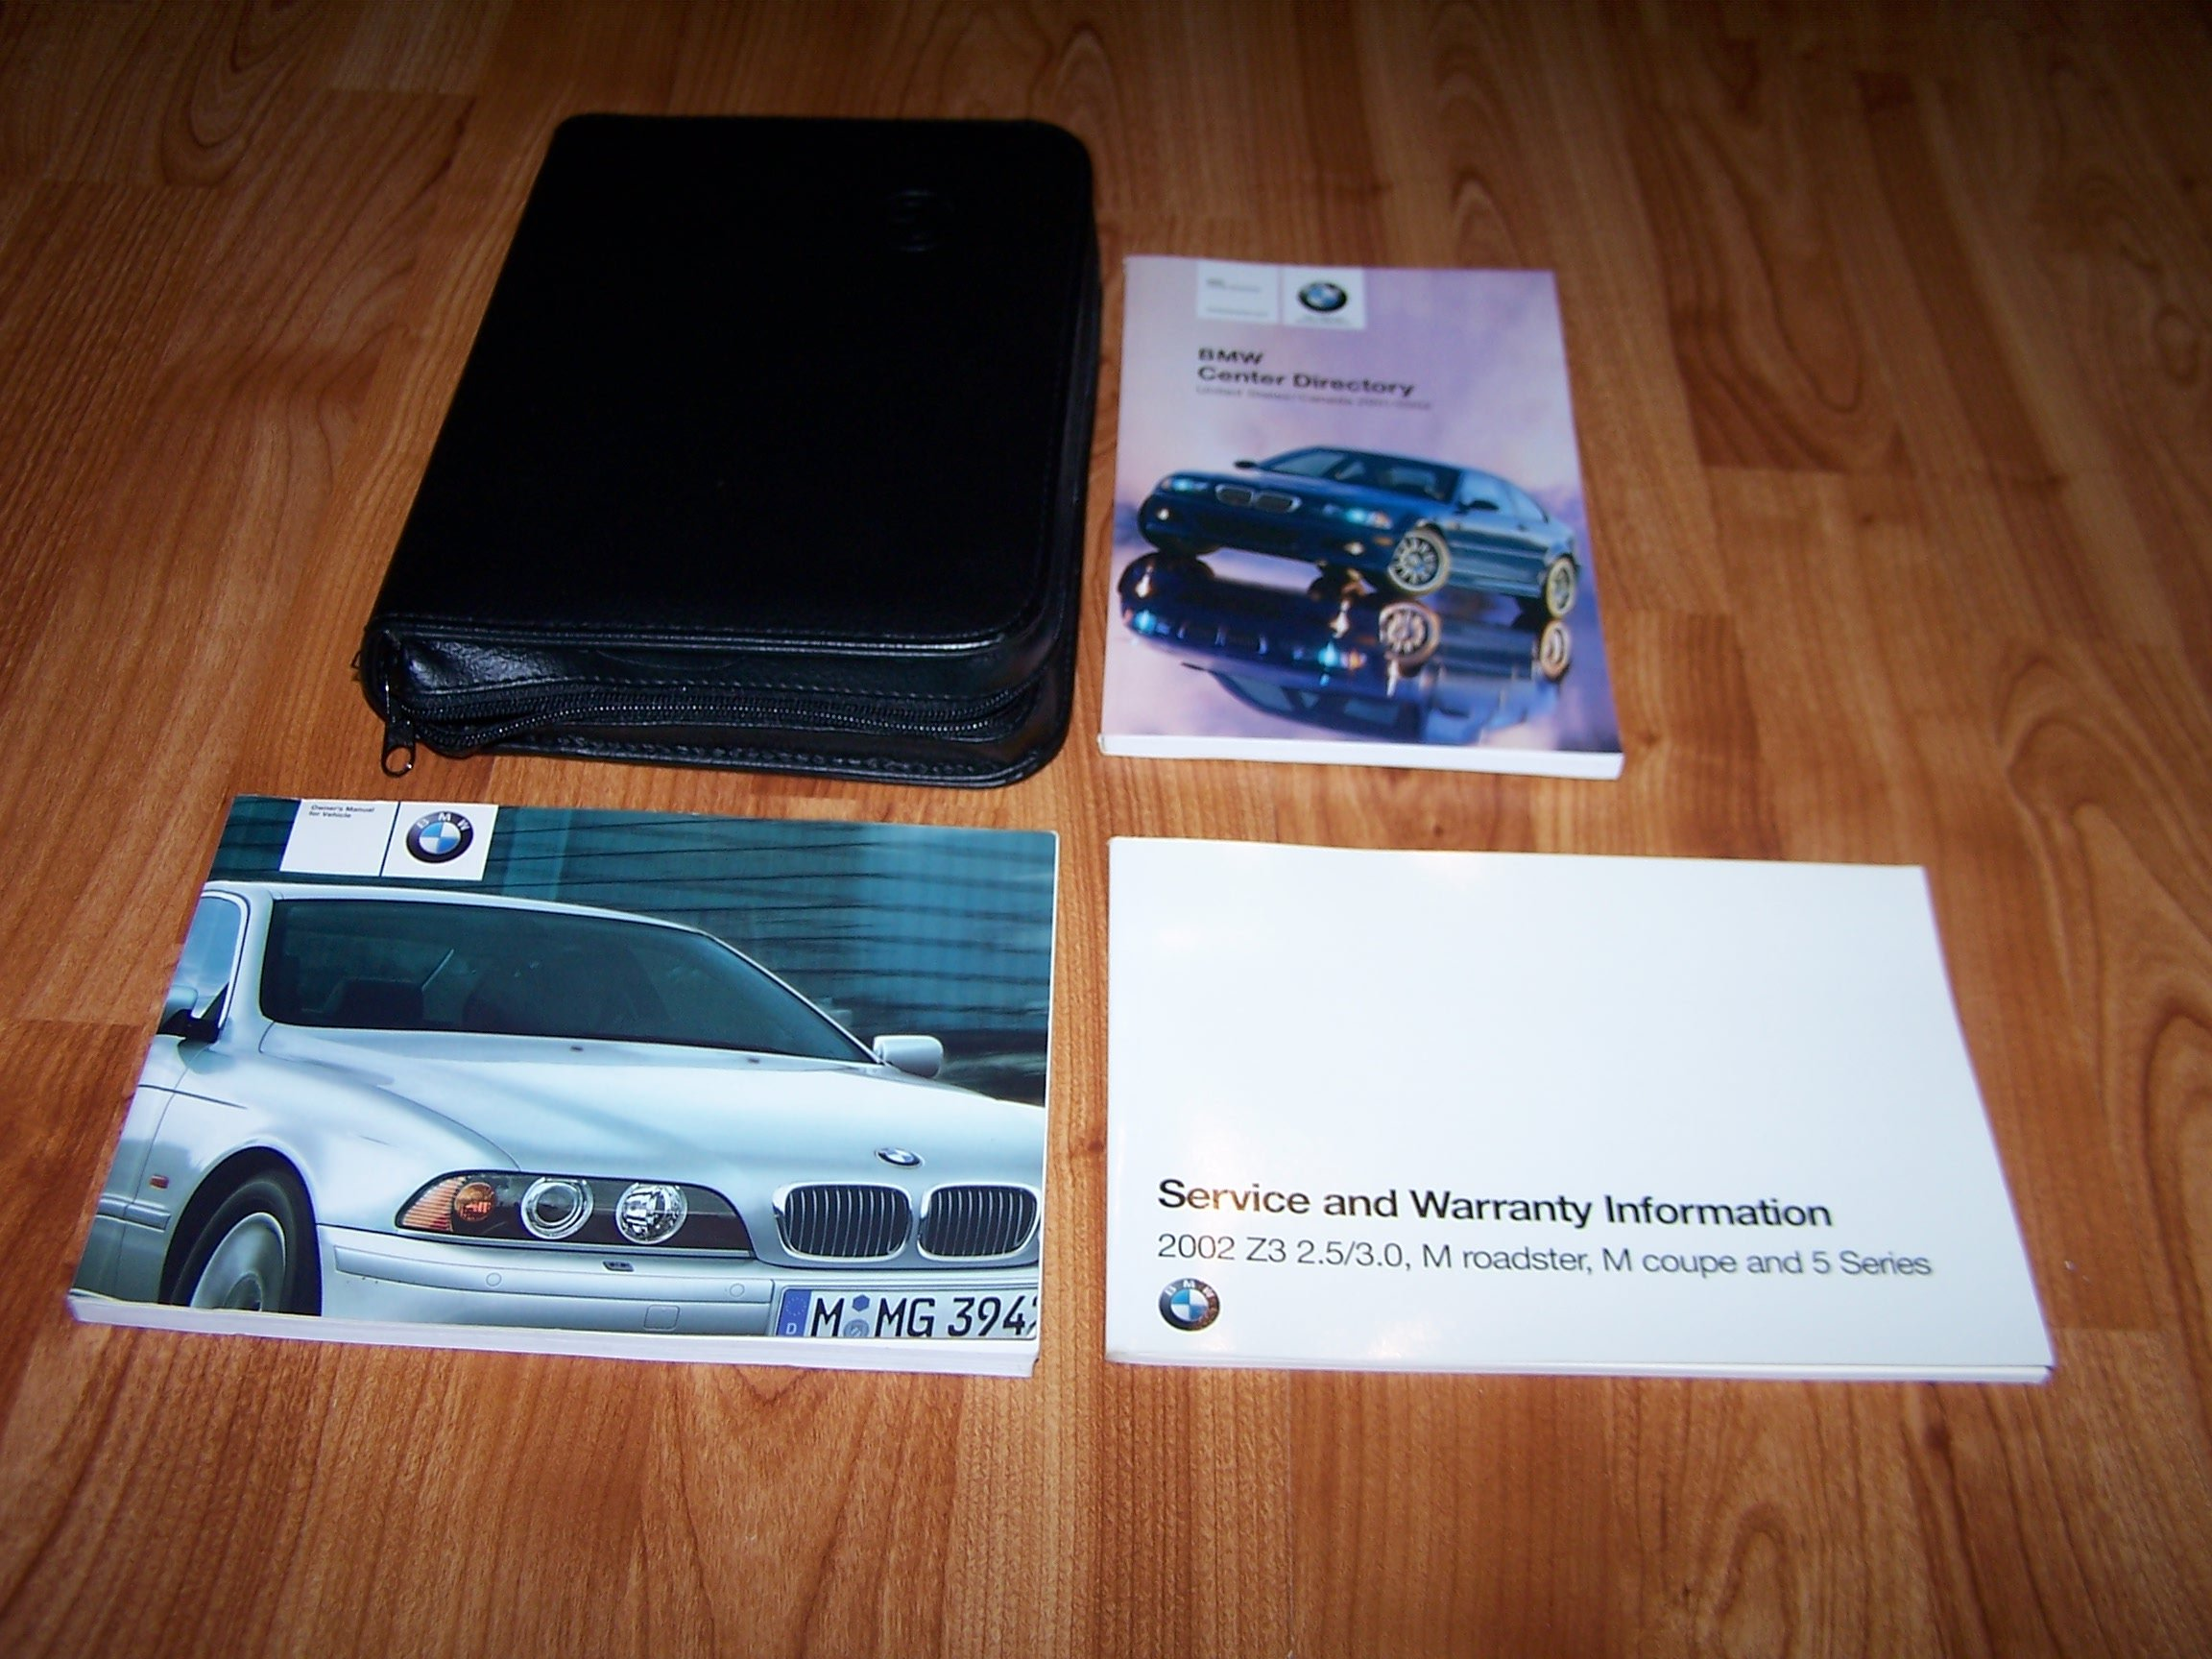 2002 bmw 525i 530i 540i sedan and sportwagon owners manual bmw rh amazon com 2002 bmw 530i owners manual 2002 bmw 525i owner's manual